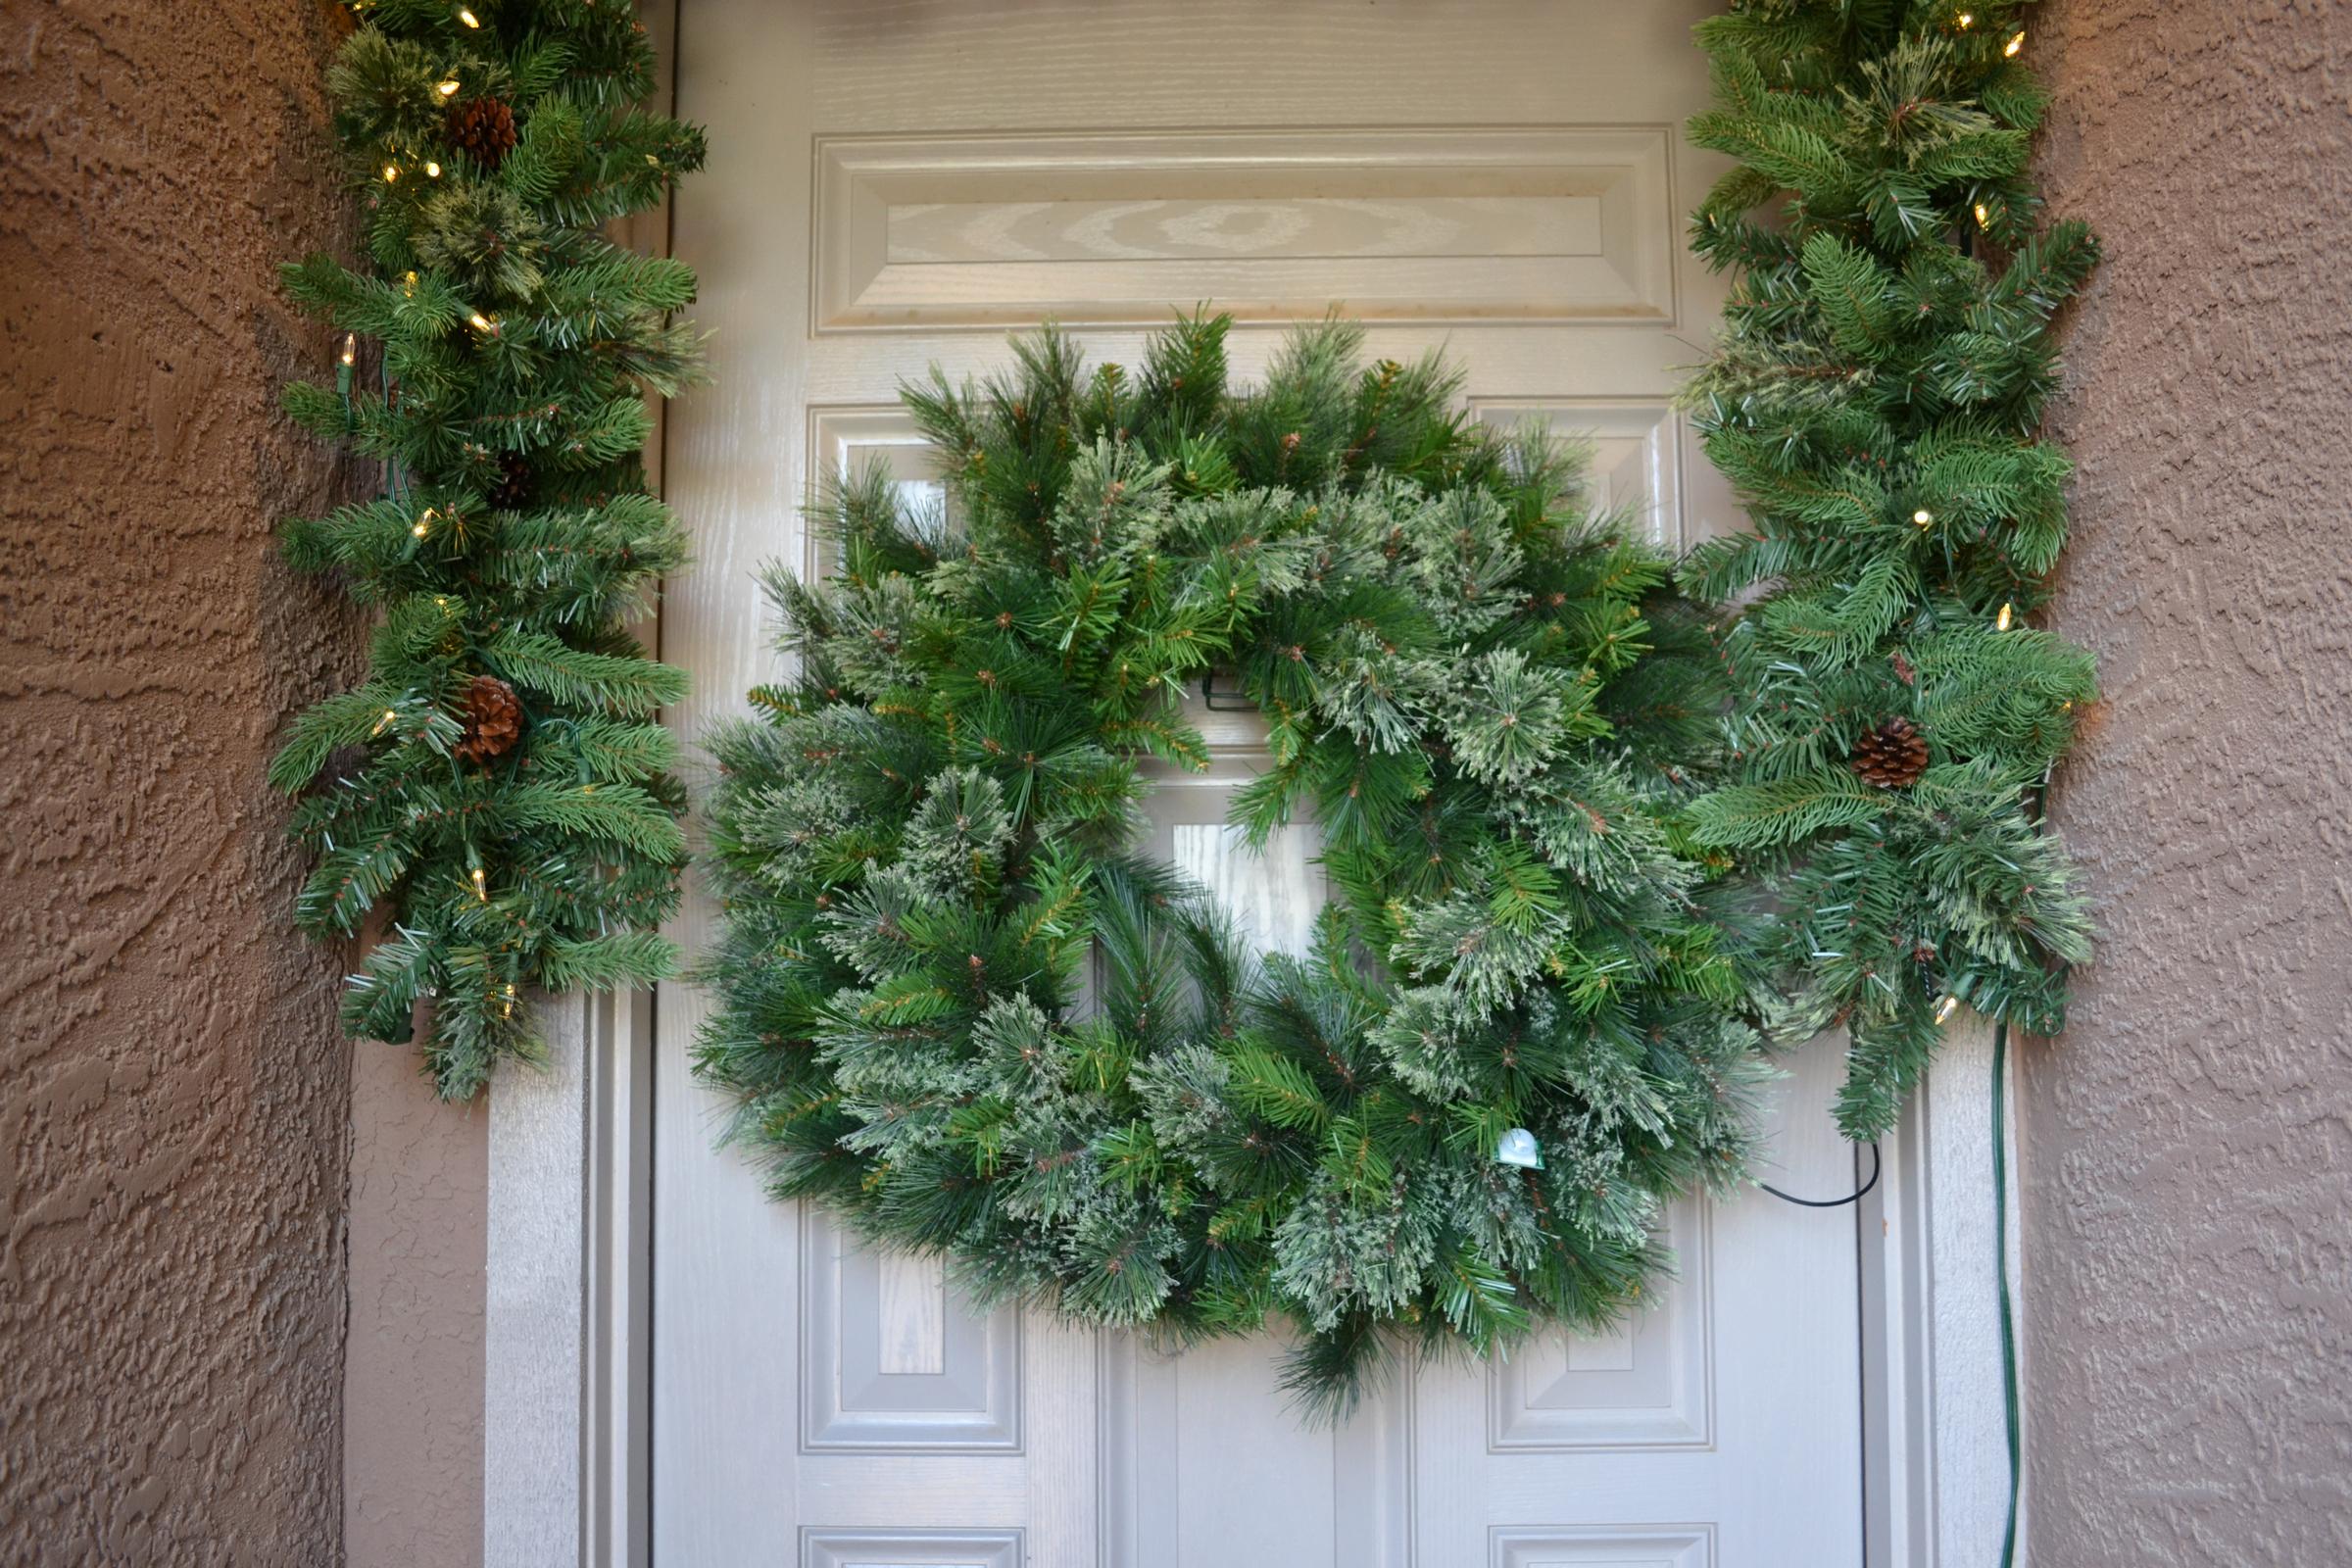 Christmas Greeting Wreath Arduino and MP3